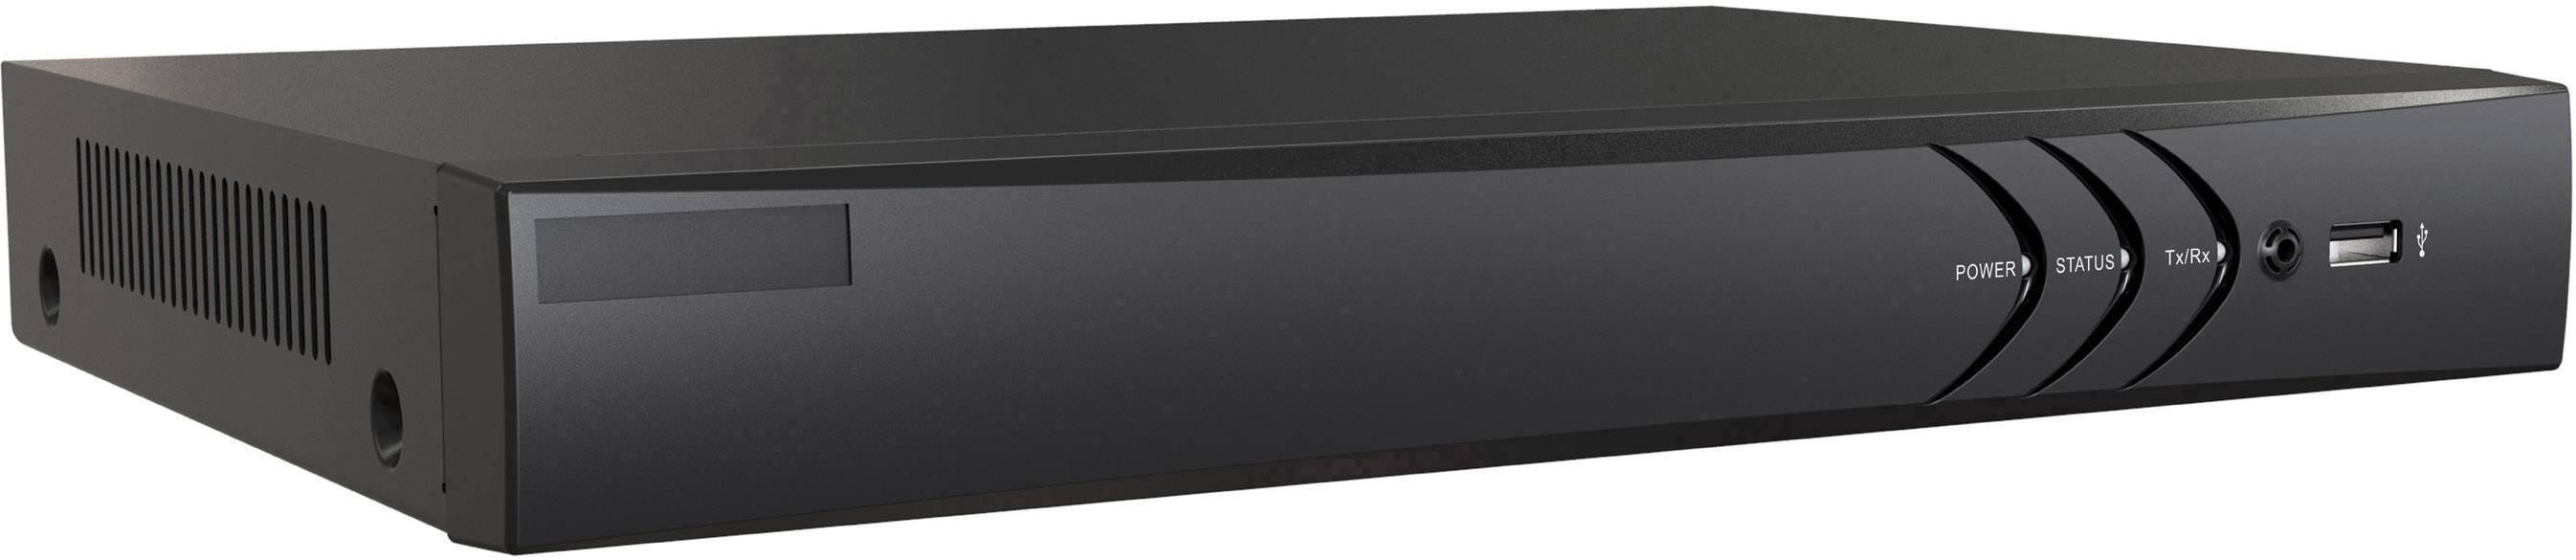 Digitálny videorekordér HiWatch DS-H204U DS-H204U, 4-kanálová